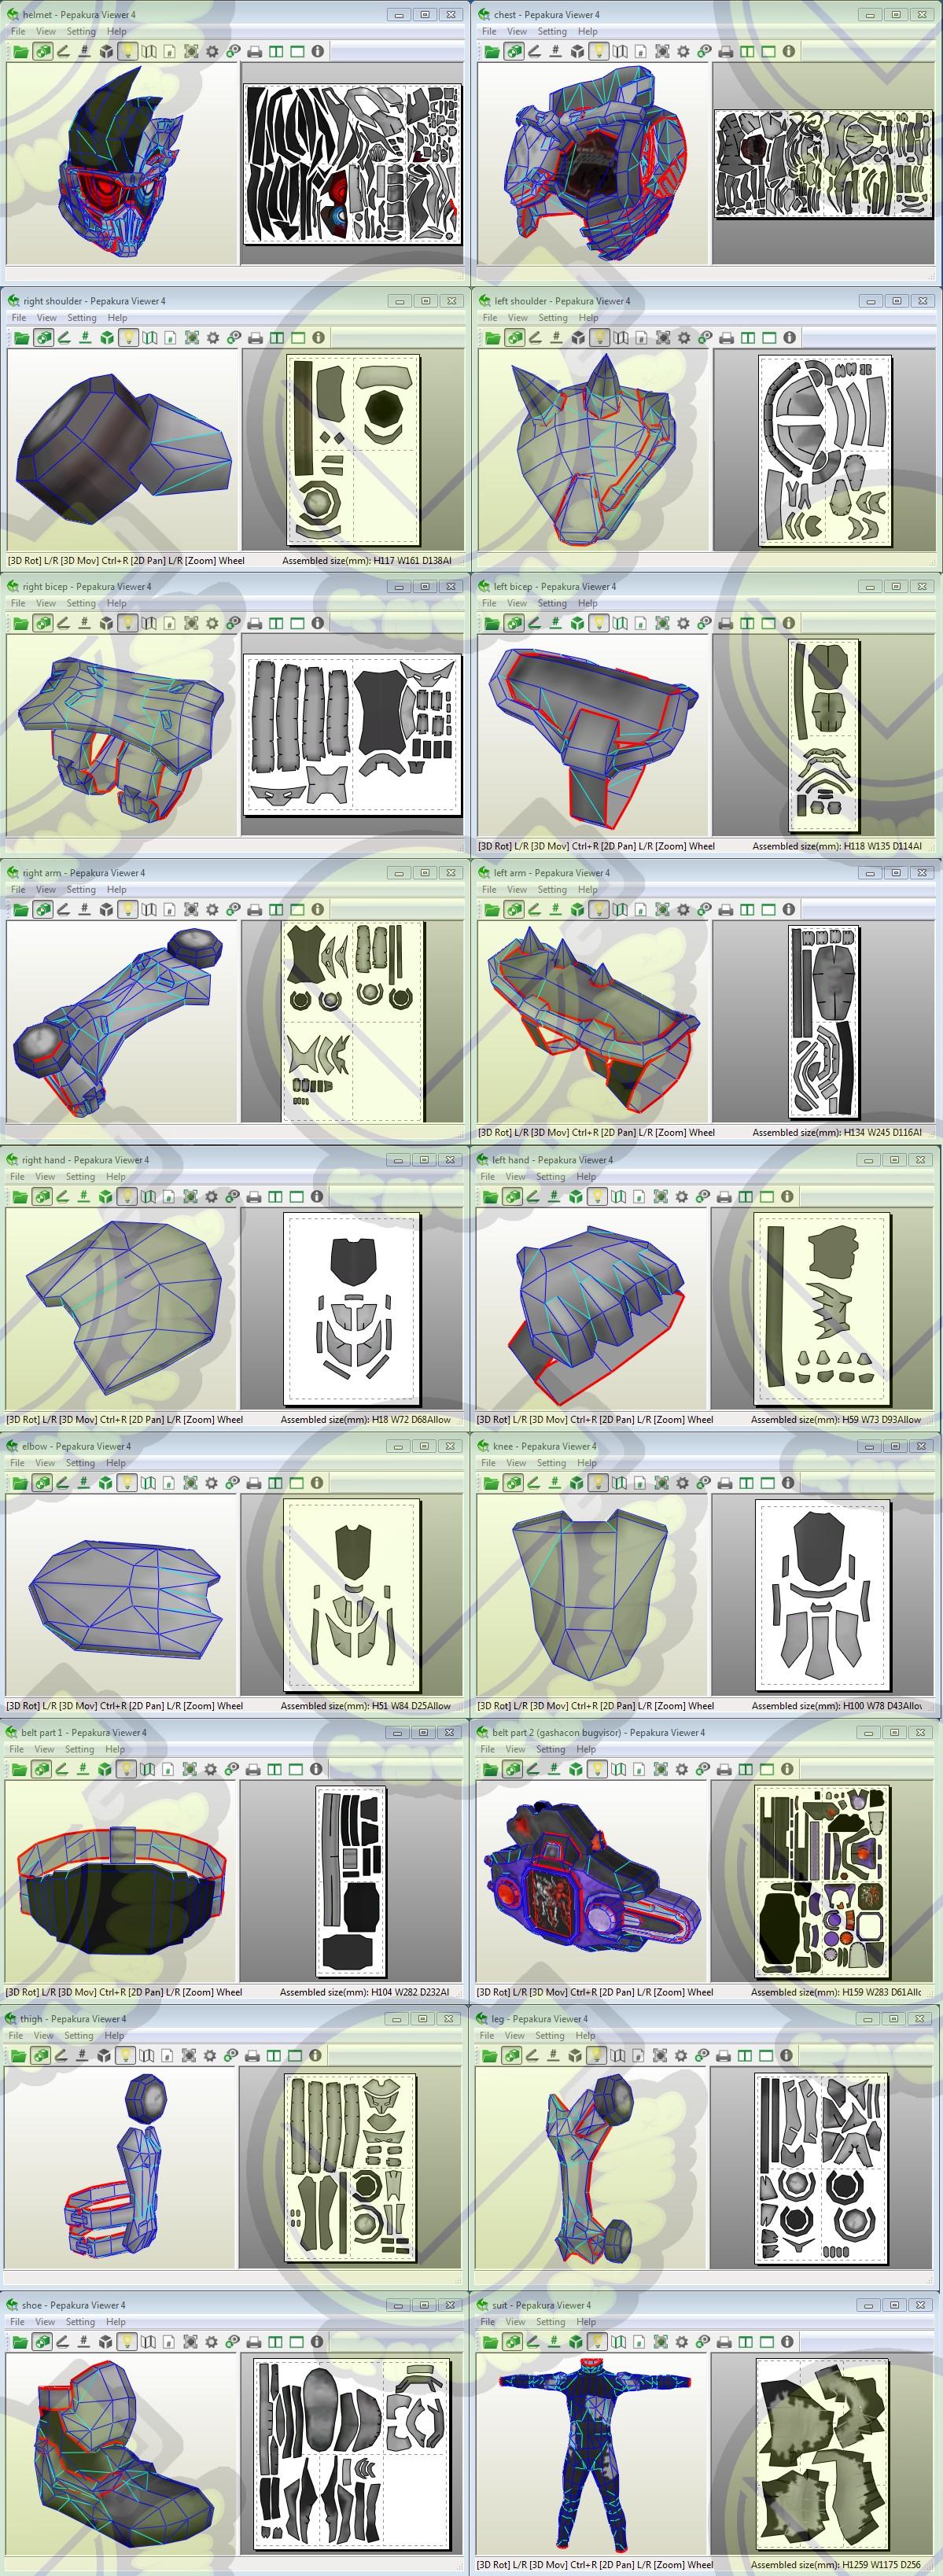 Kamen Rider Papercraft Kamen Rider Genm Lvl 10 Dangerous Zombie Costume Template Pattern